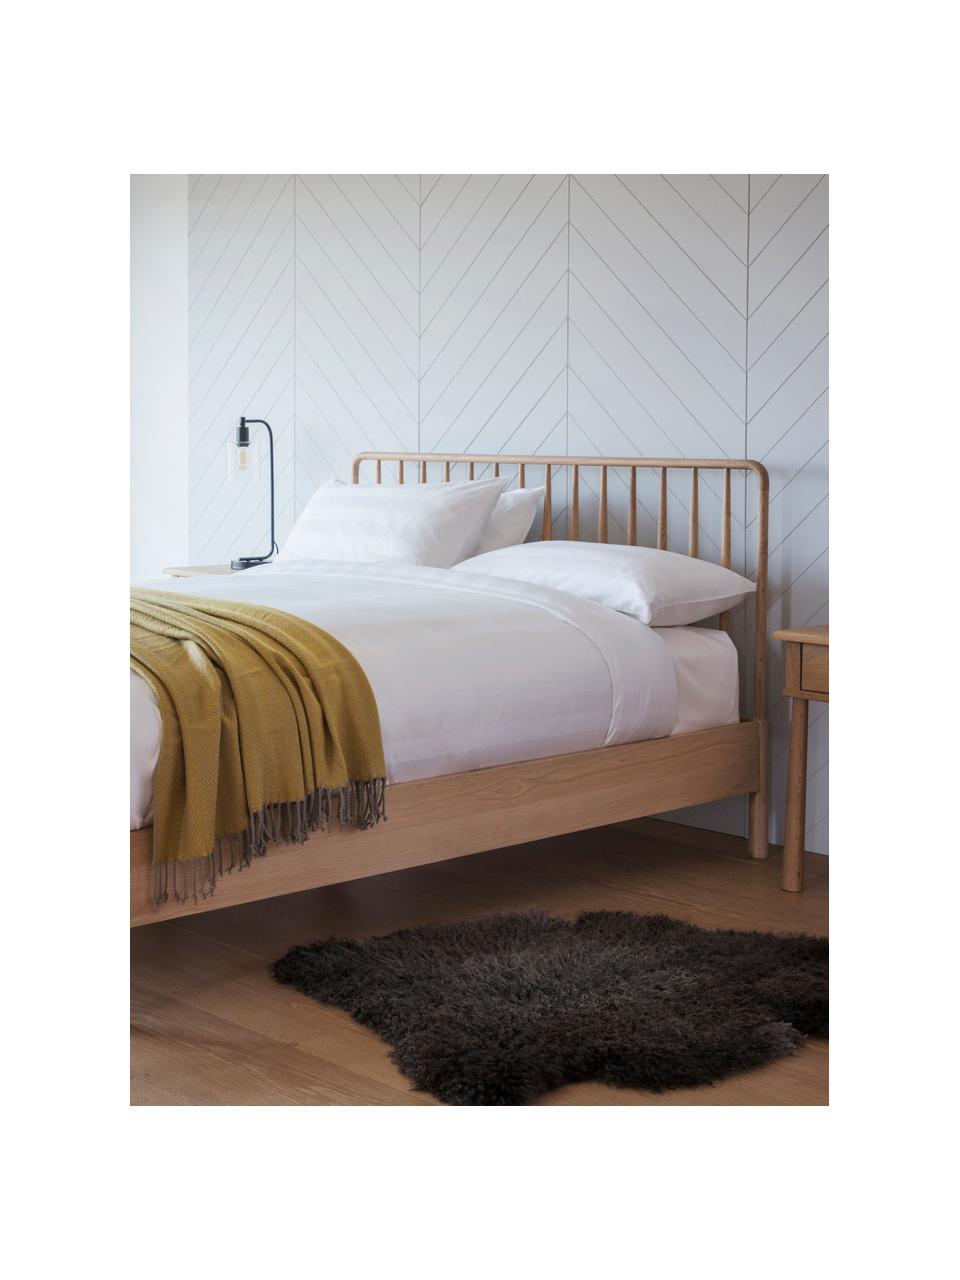 Bett Wycombe aus Eichenholz, Eichenholz, 180 x 200 cm